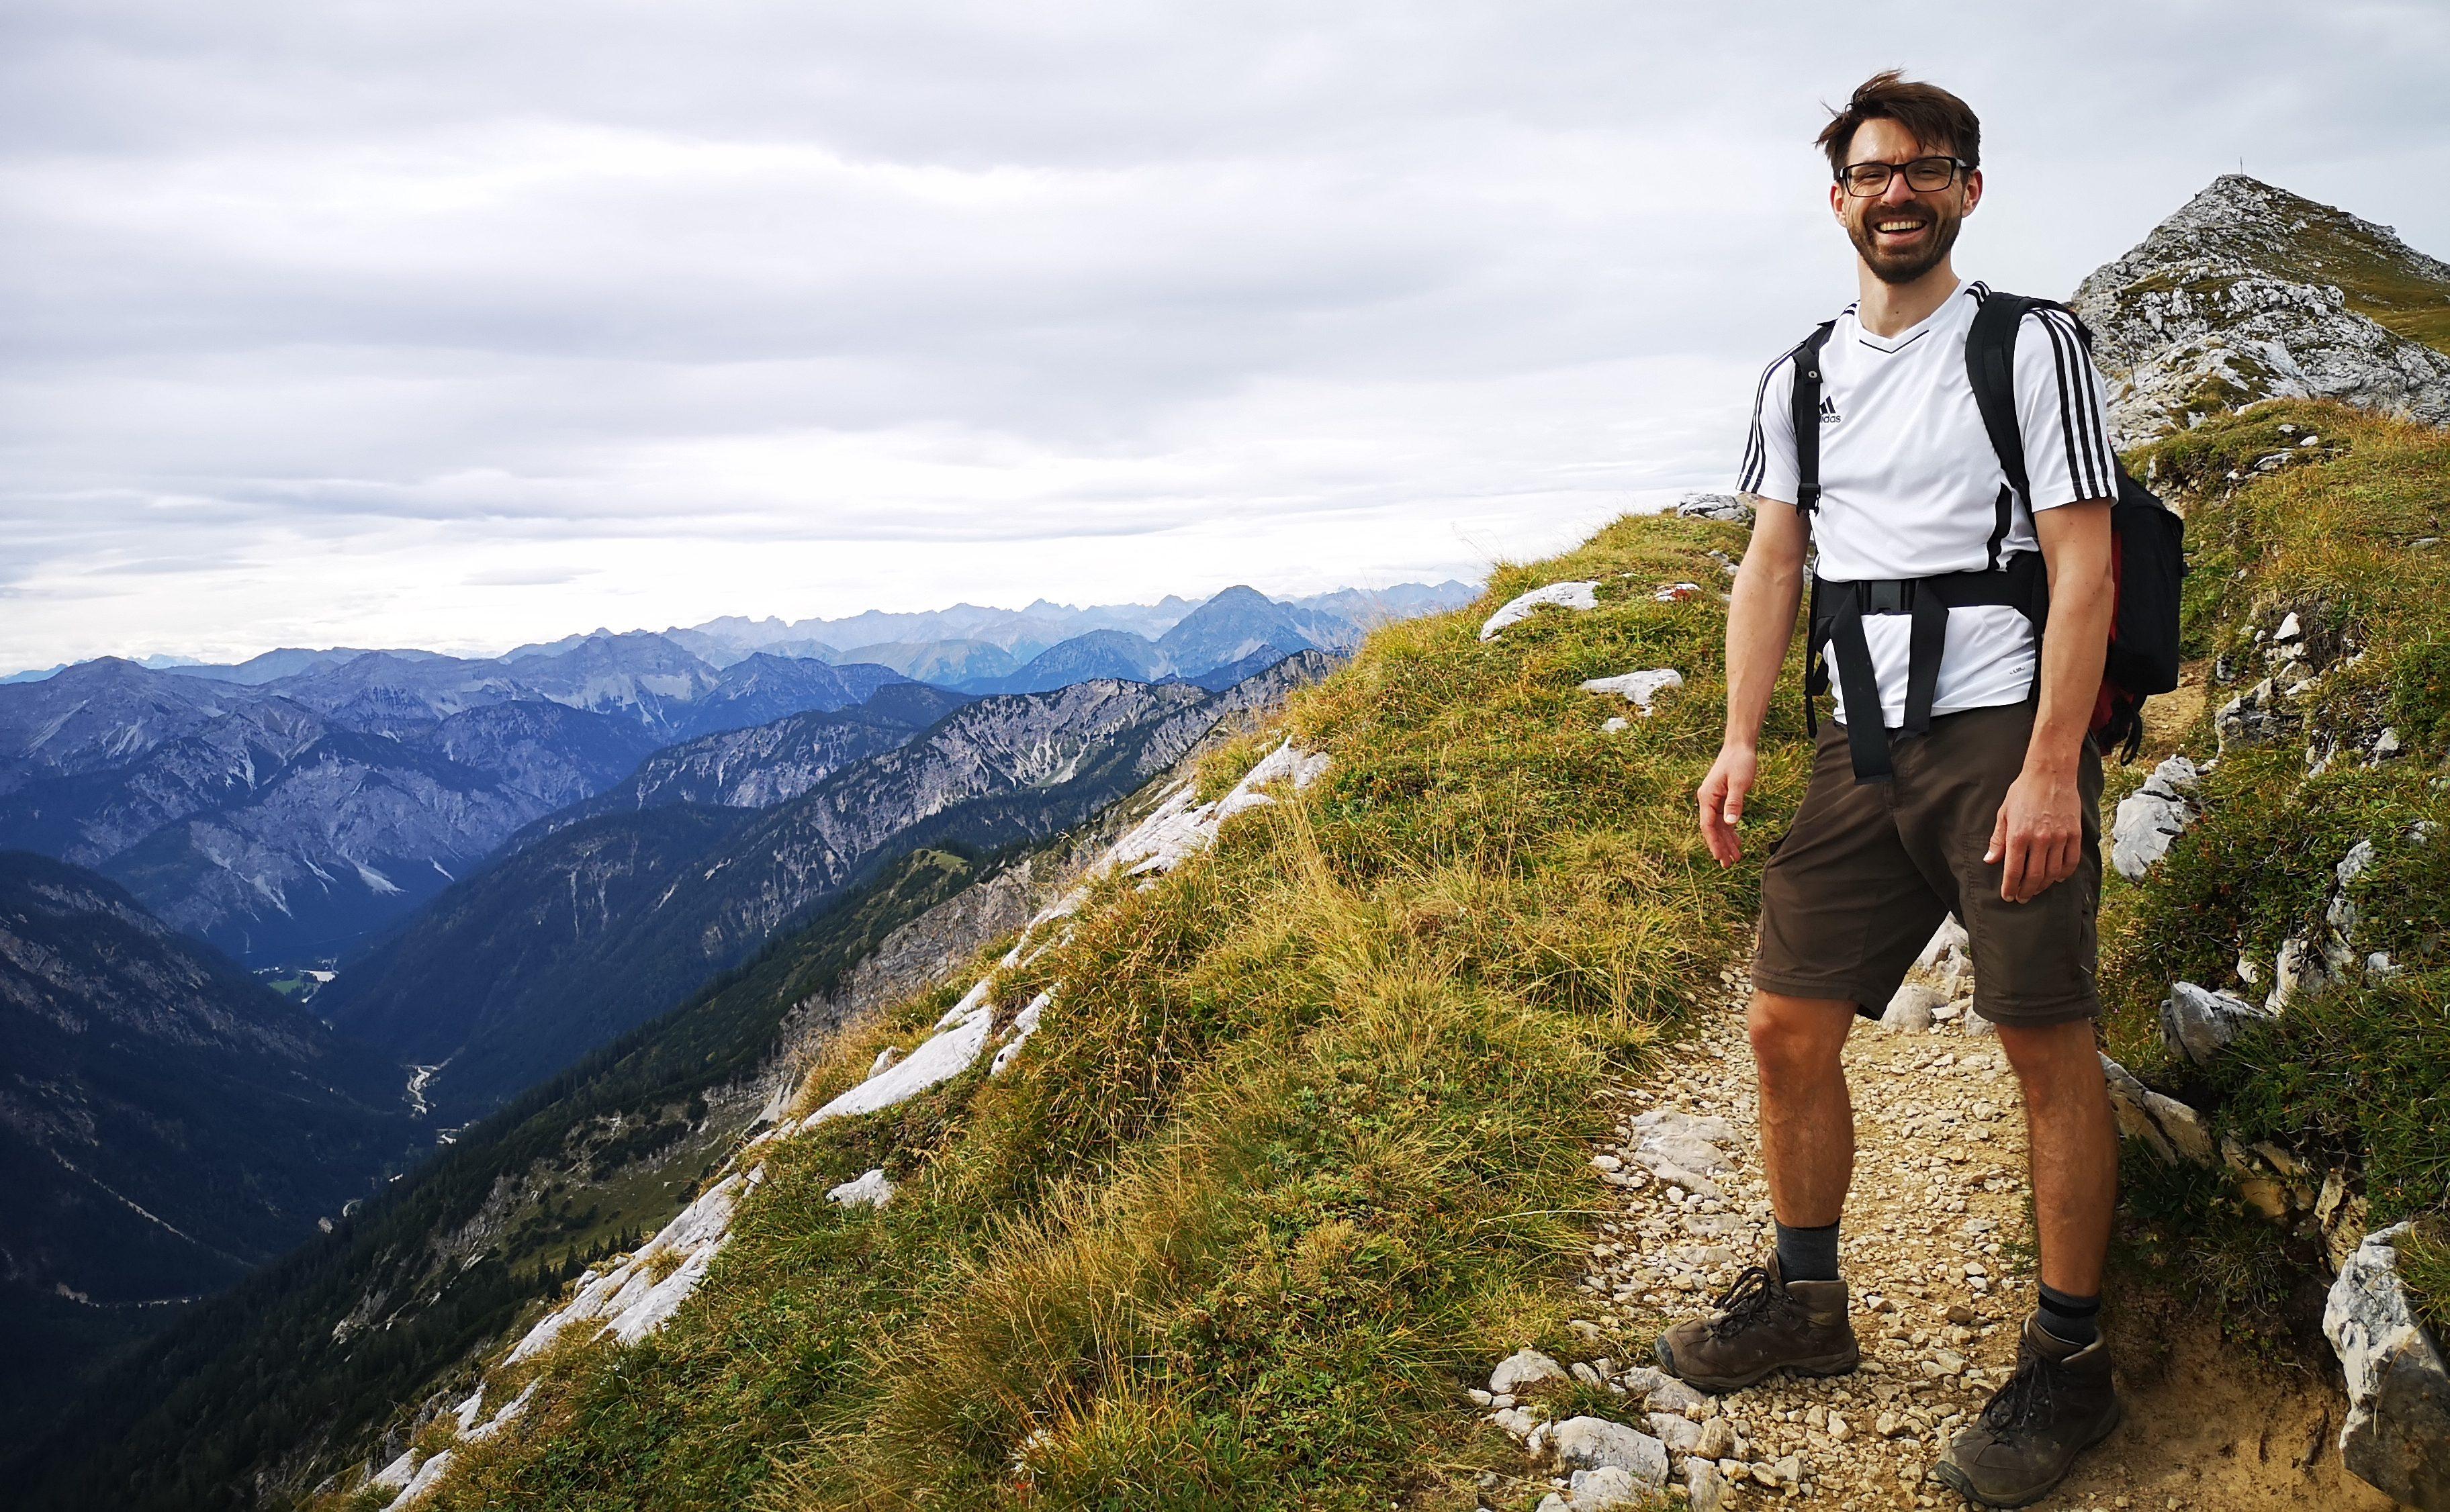 About Sebastian Engel Wolf